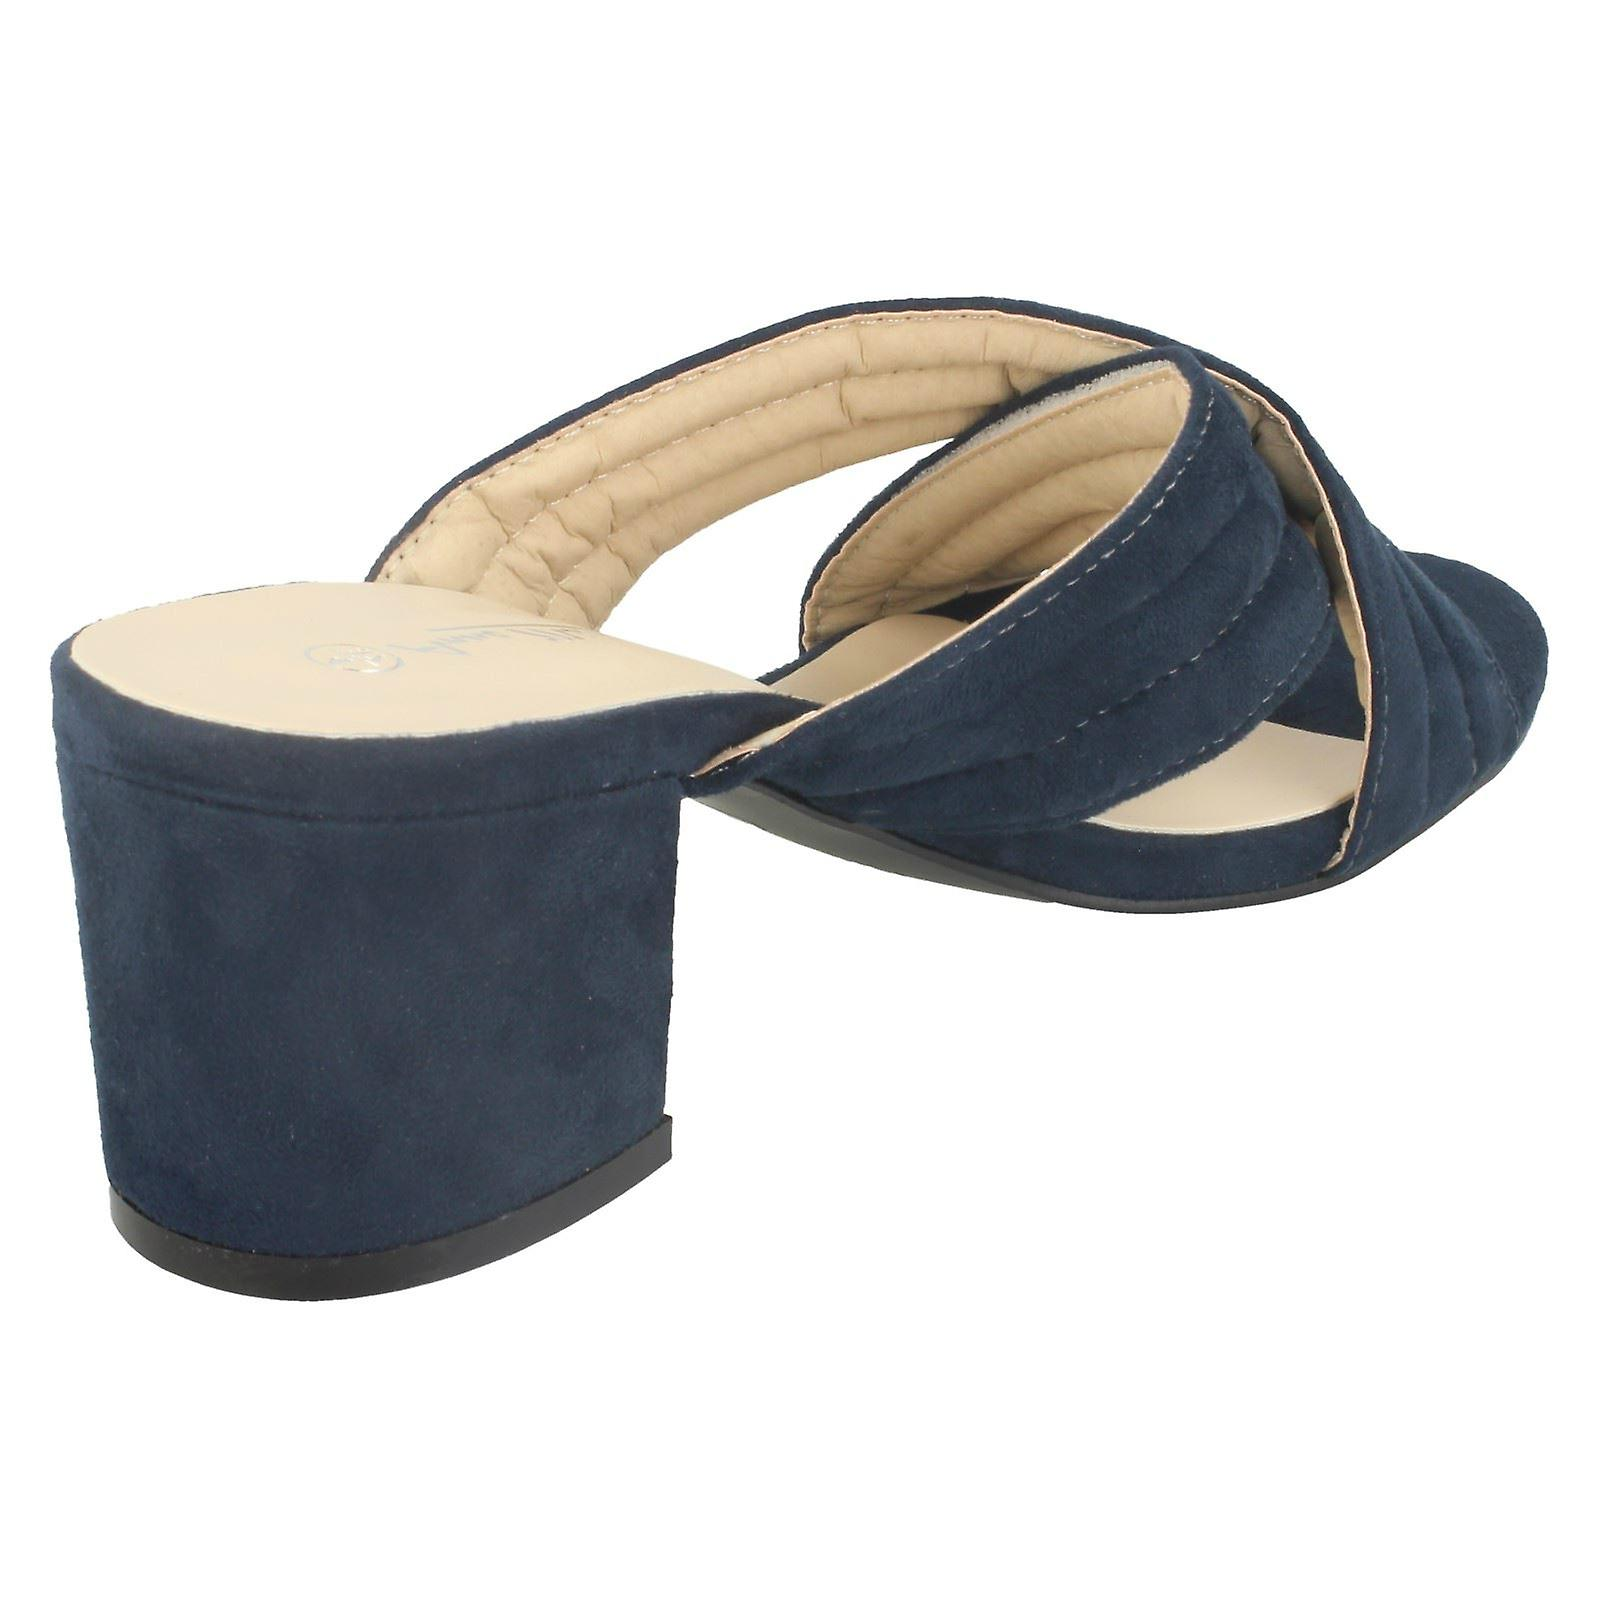 Ladies Anne Michelle Mid Heel X Strap Vamp Mule Sandals F10728